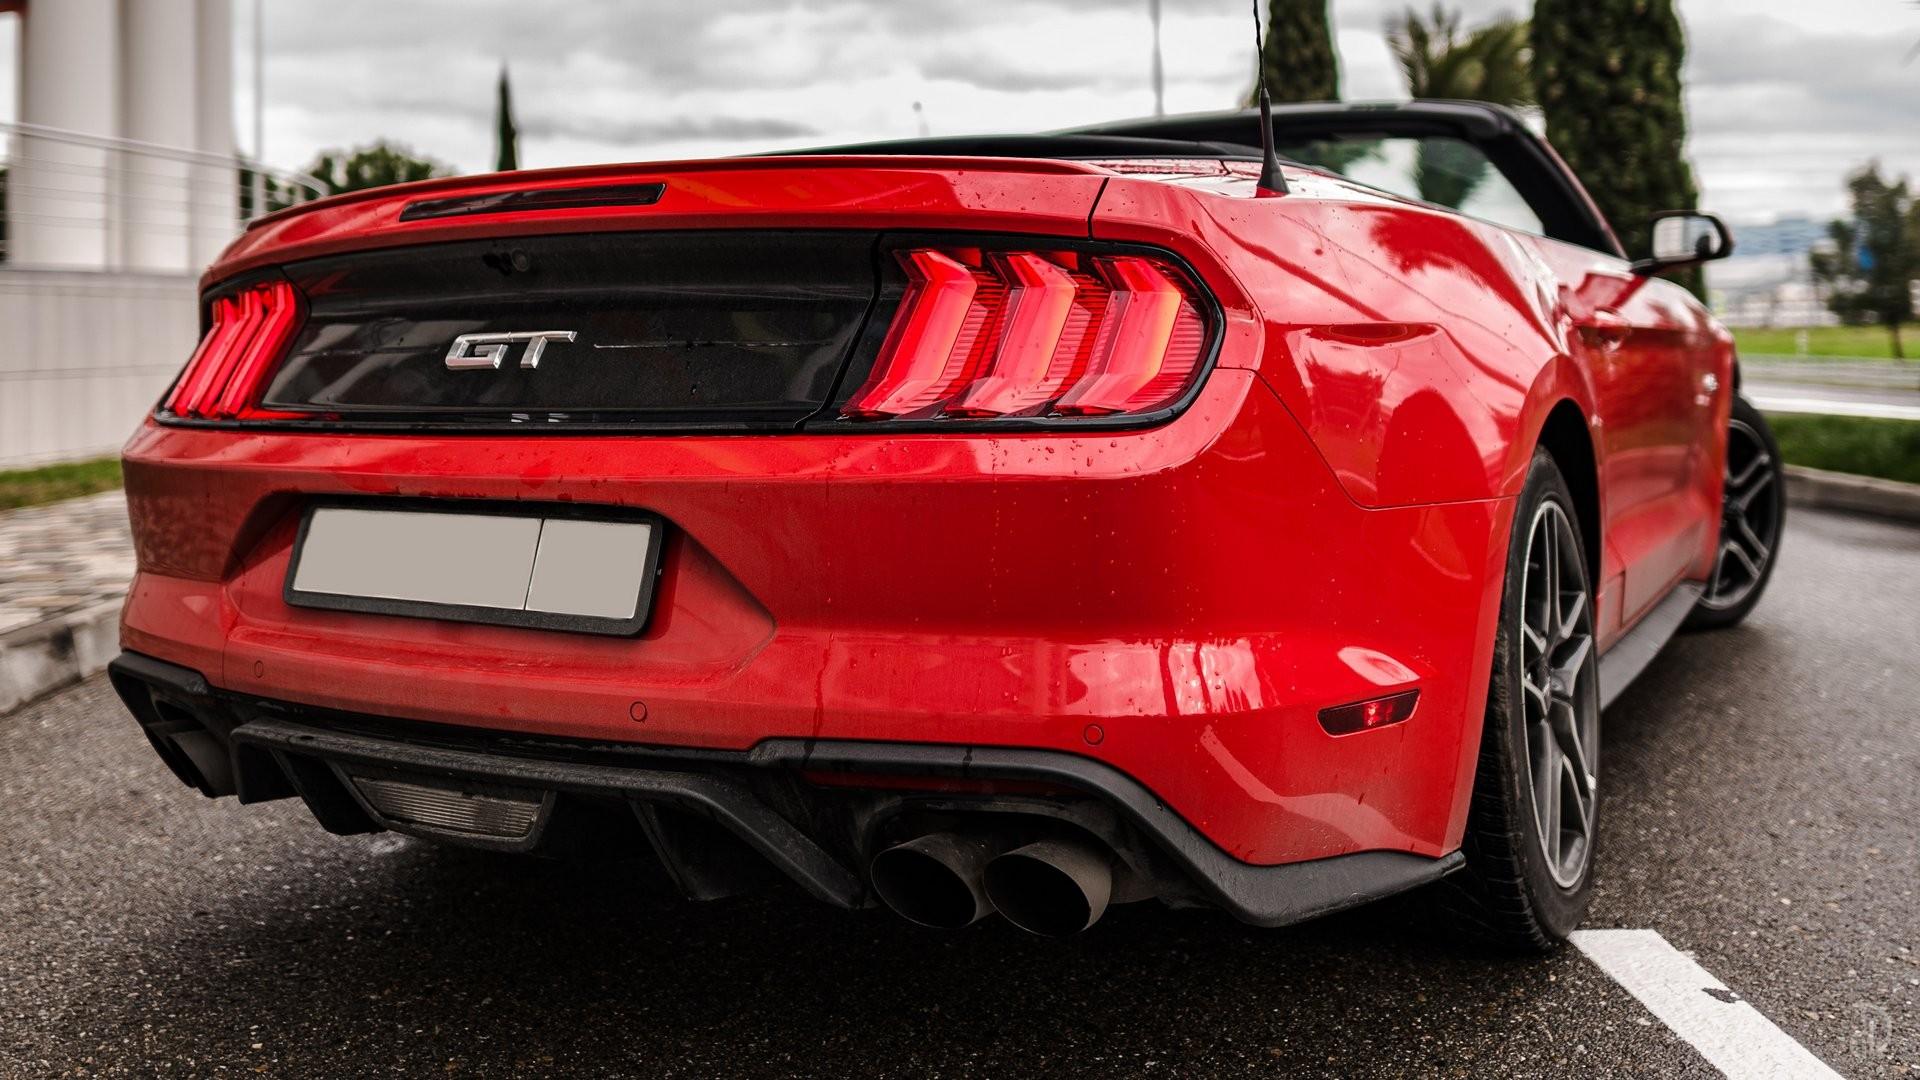 Аренда Ford Mustang GT 5.0 в Сочи. Фото 4